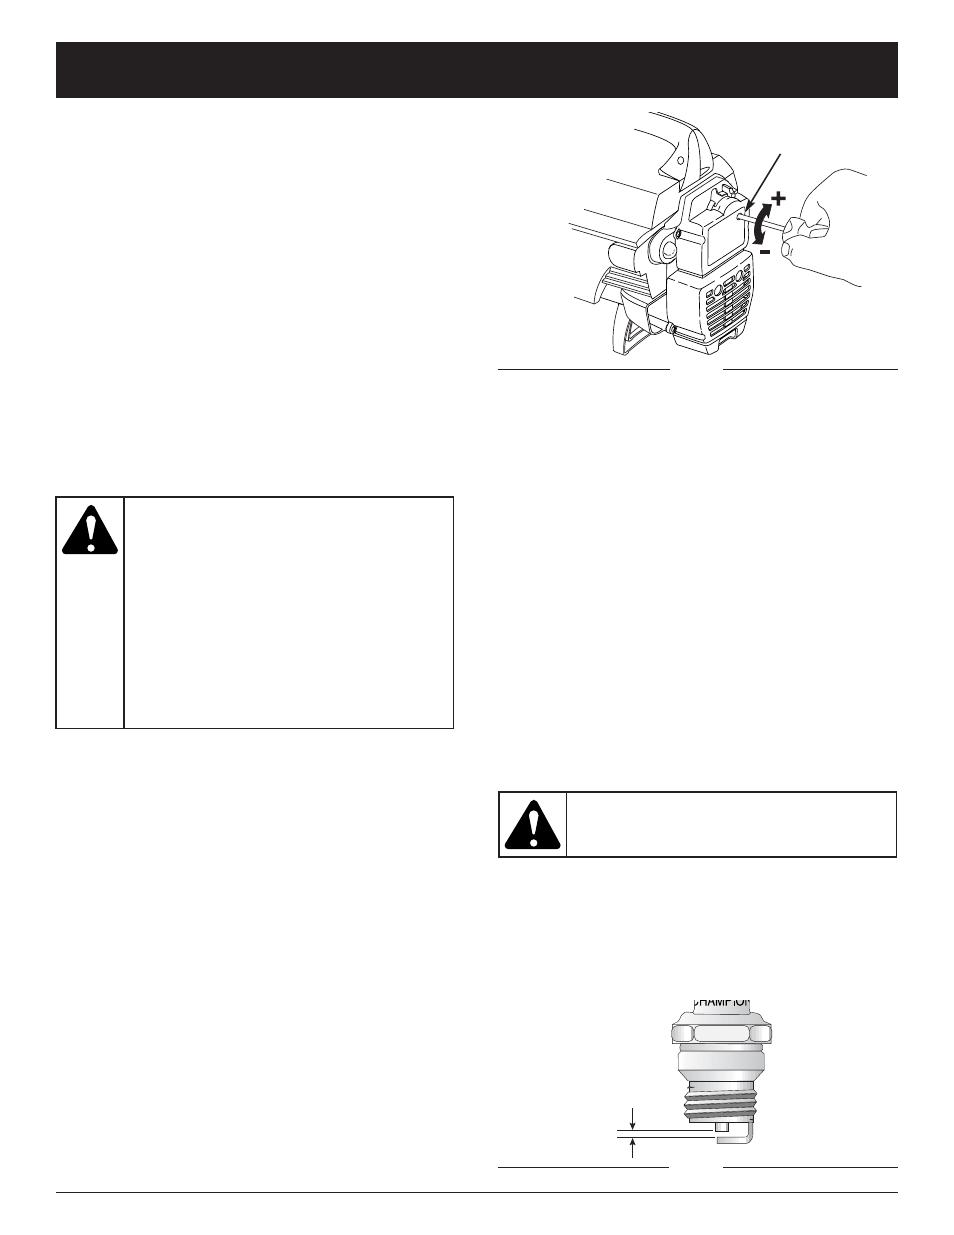 Maintenance and repair instructions   Bolens BL3100 User Manual